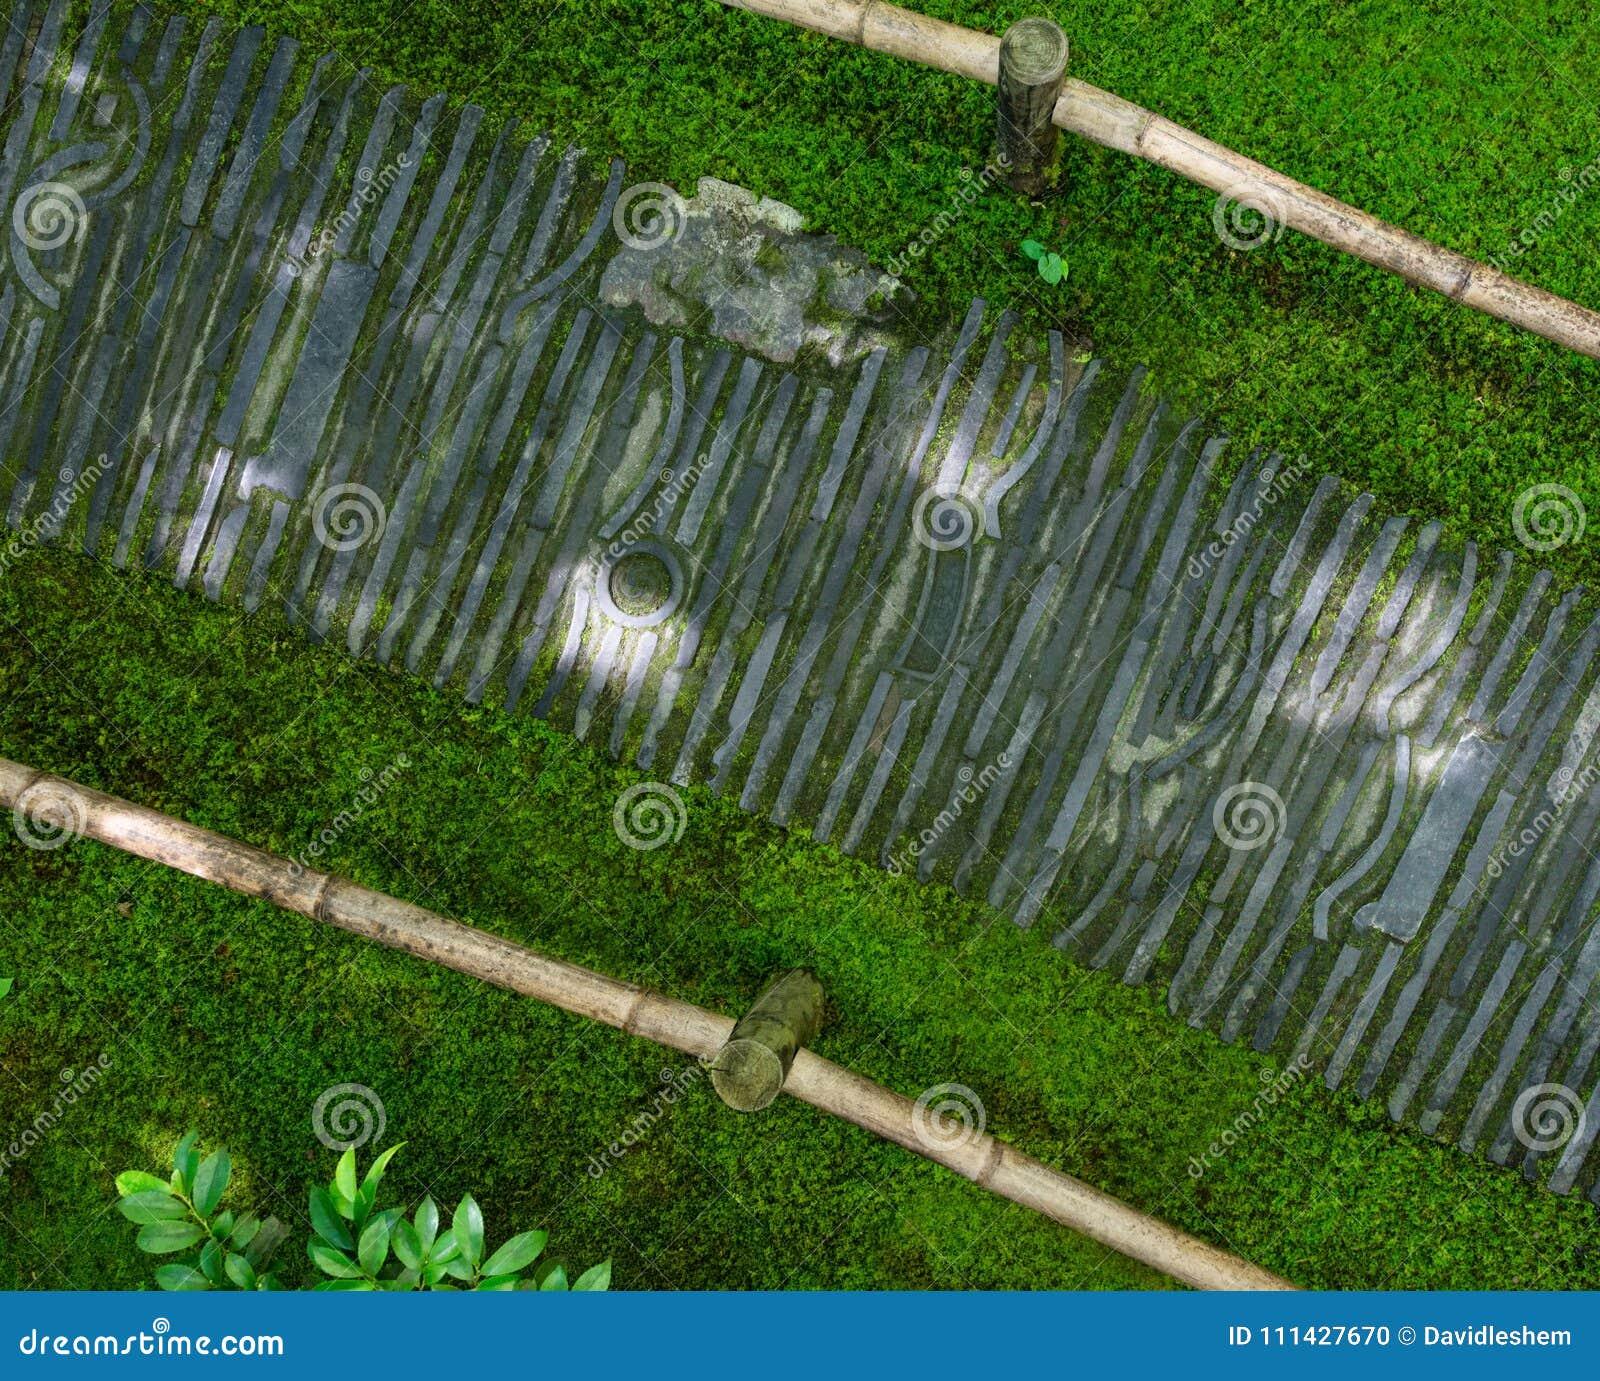 Bending stone path Japanese Garden & Bending Stone Path Japanese Garden Stock Photo - Image of ...